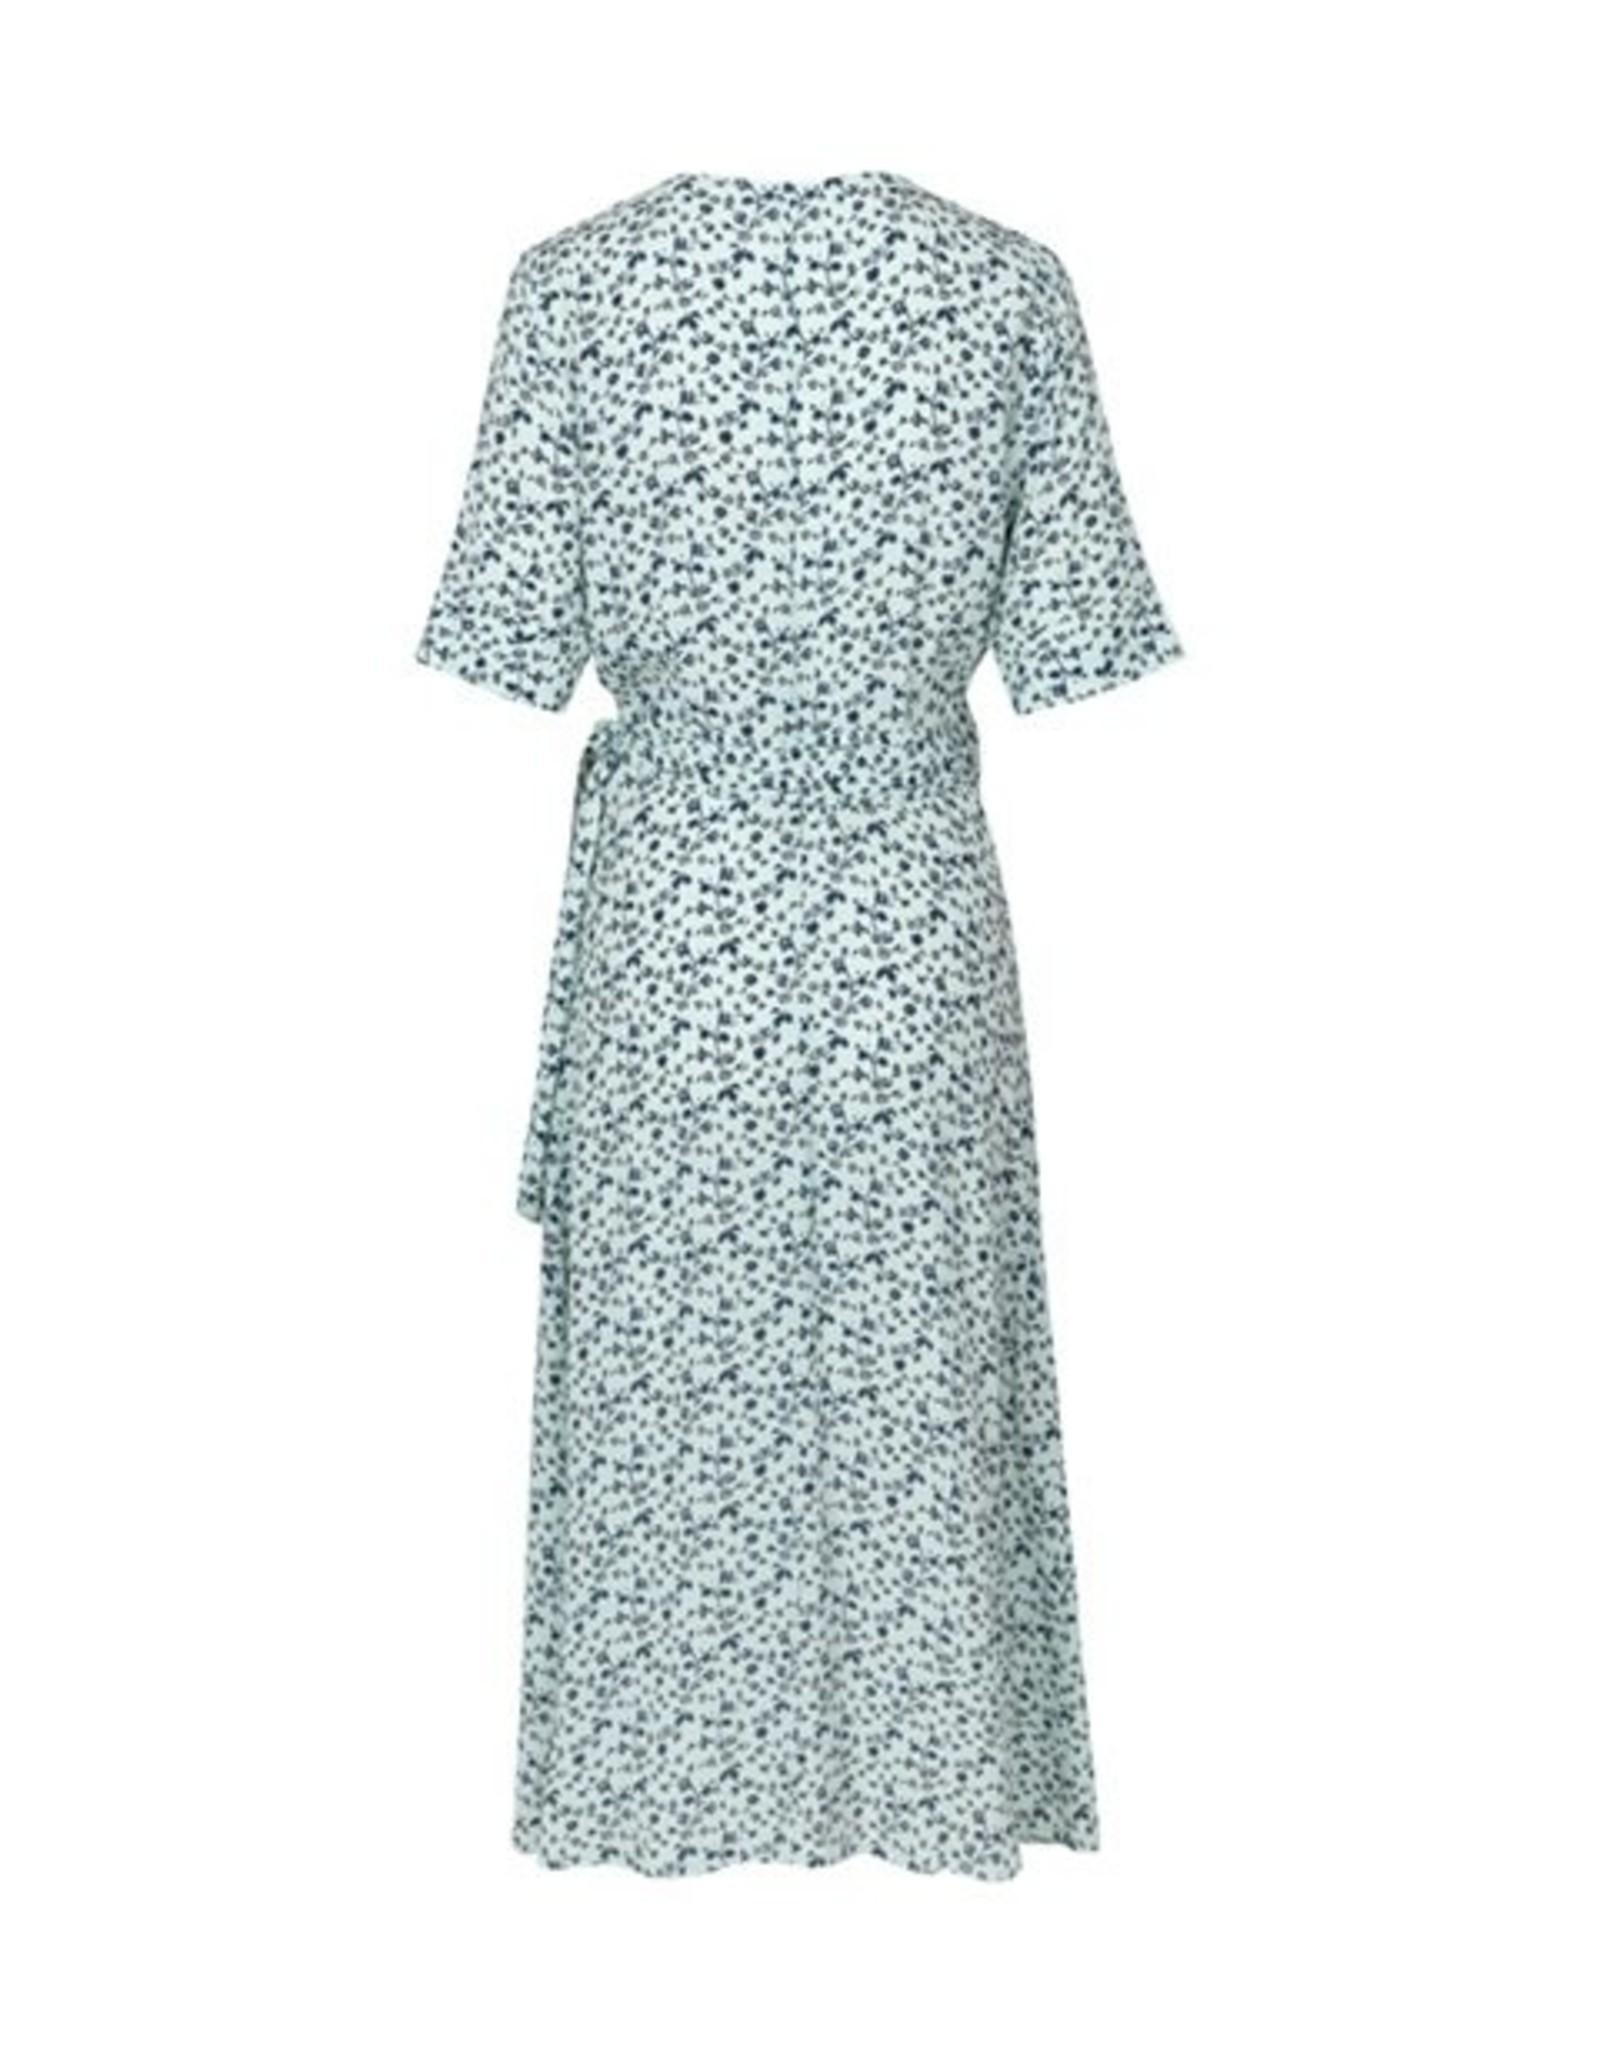 MbyM Shubie dress floral